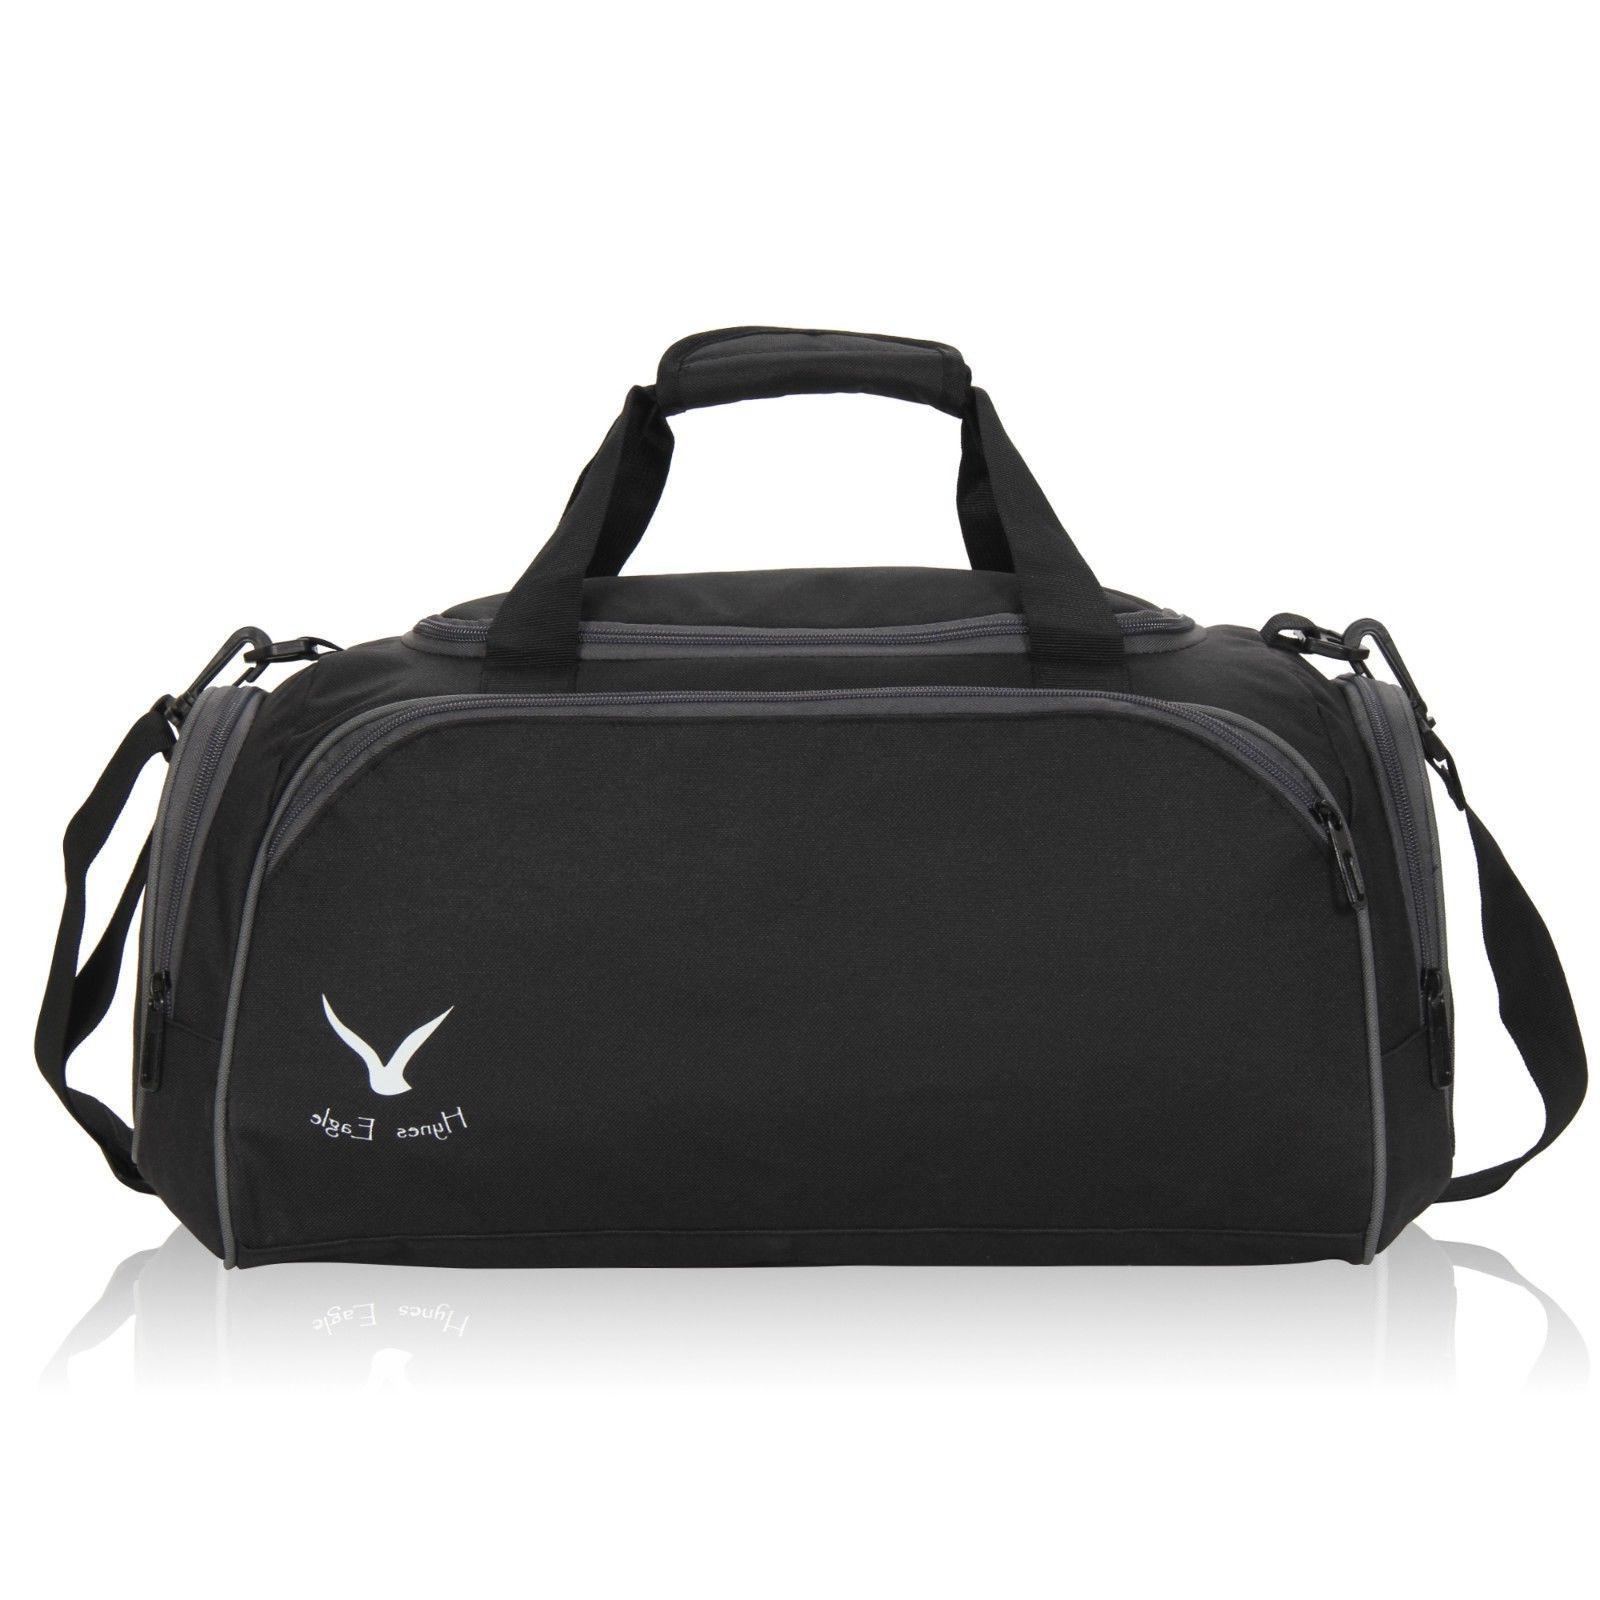 777eac7f4aab Men Sports Gear Bag Portable Travel Duff...